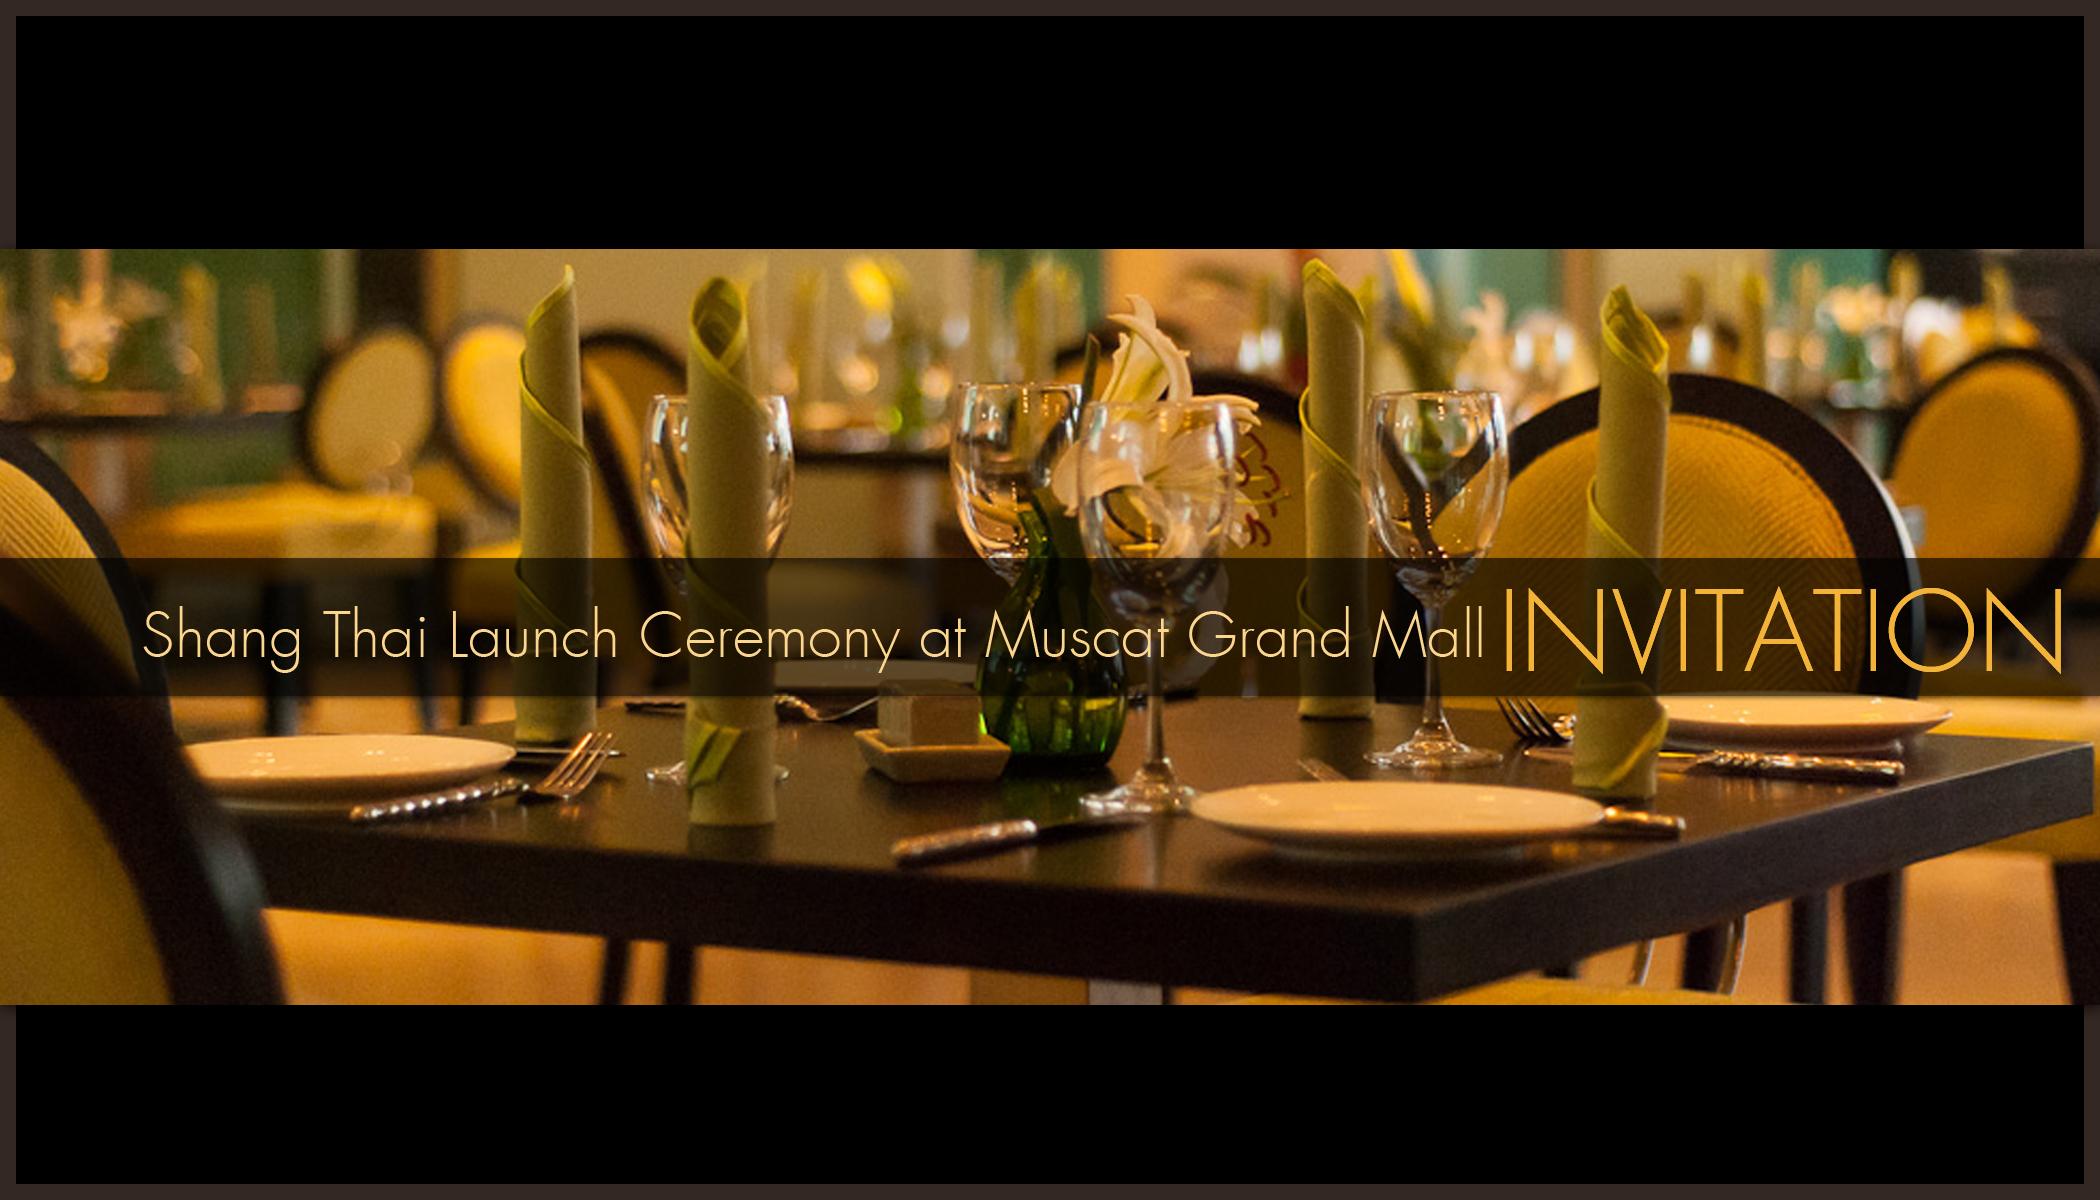 thai cuisine Muscat | Andy in Oman